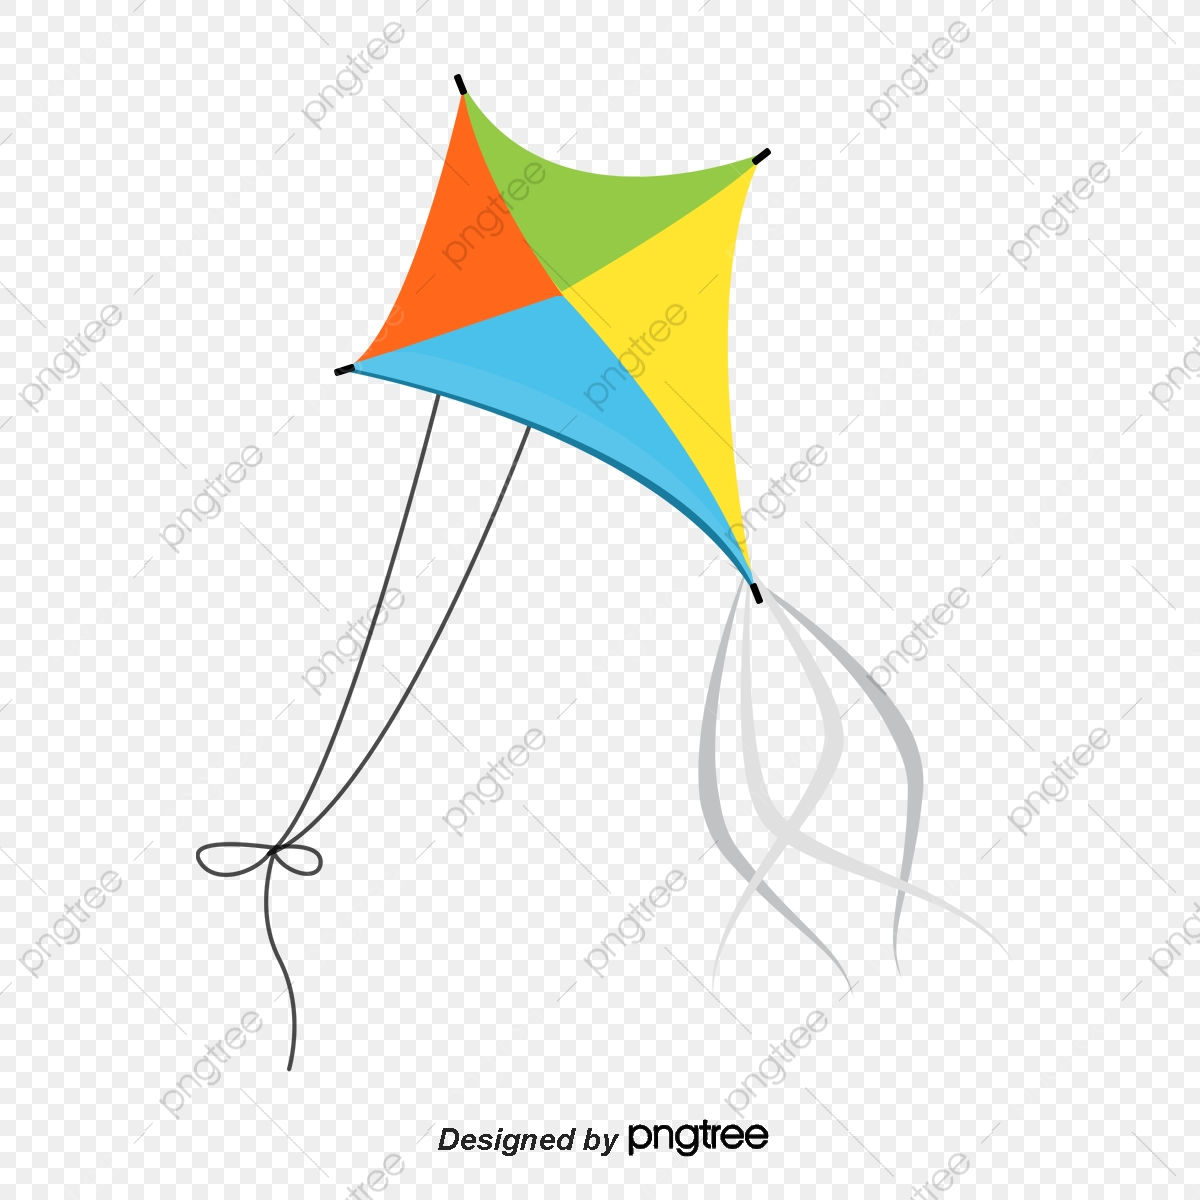 Cartoon Kite Cartoon Clipart Fly A Kite Color Kite Png